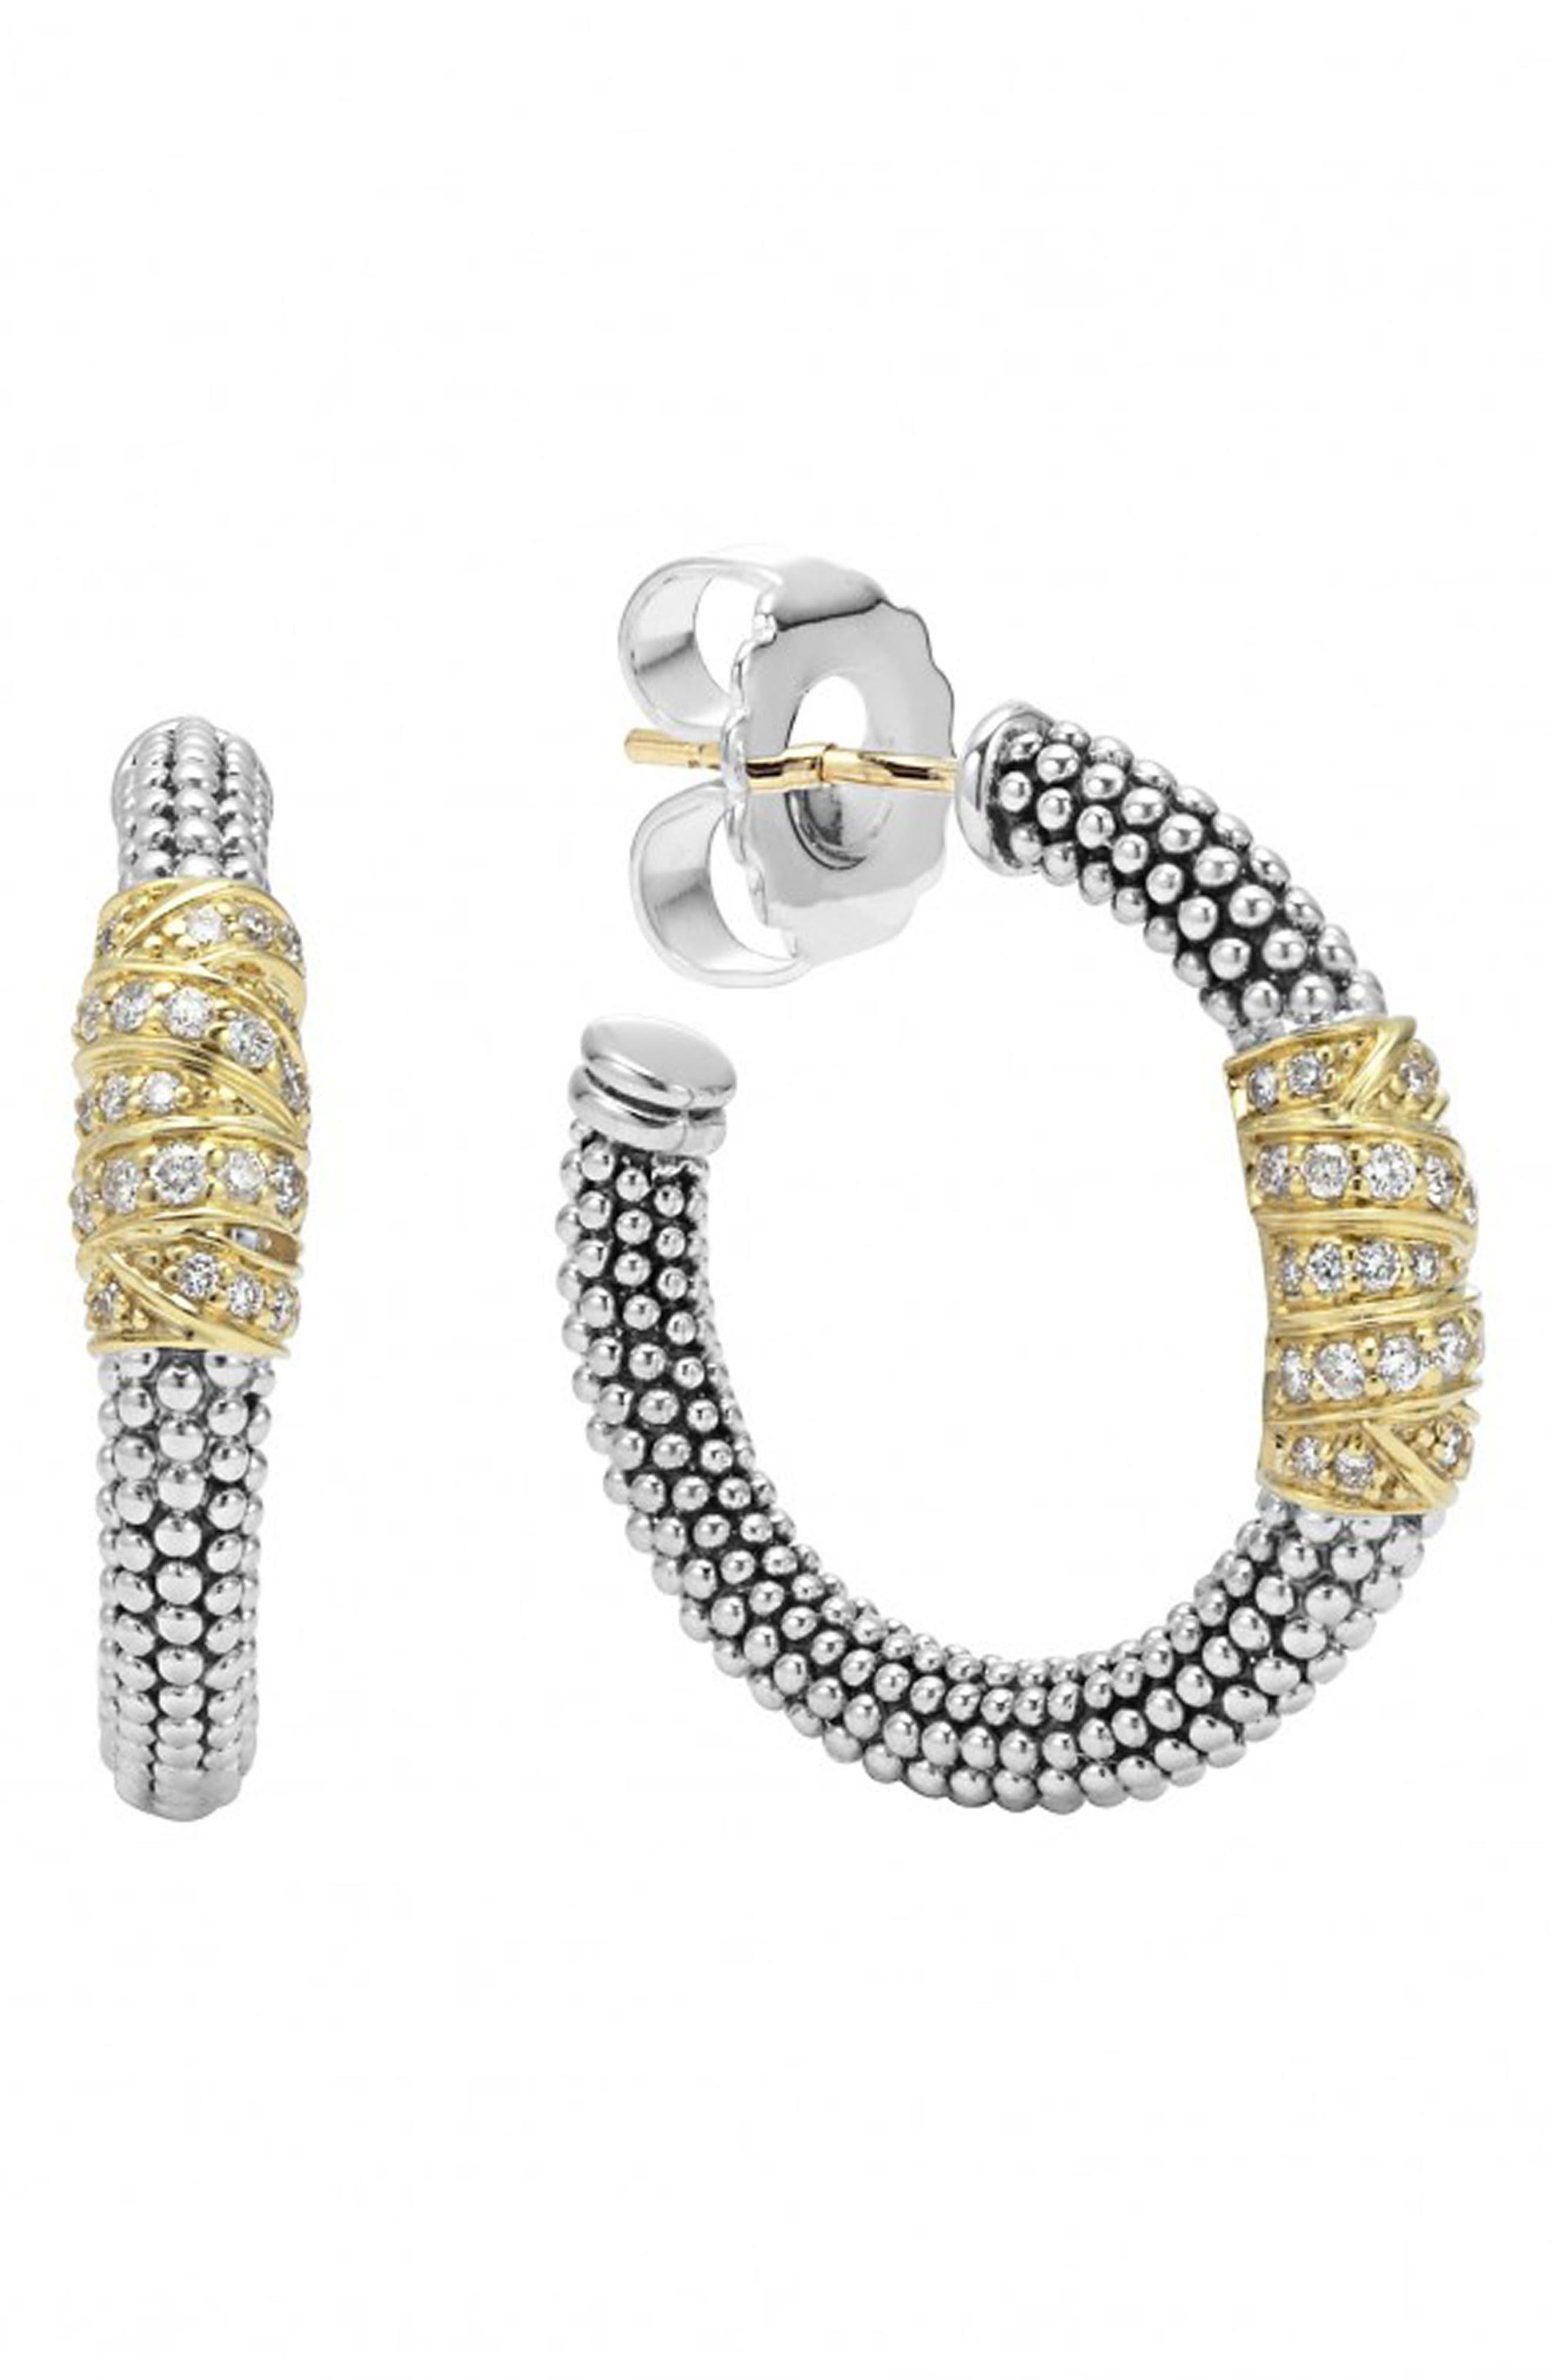 'Embrace' Caviar Diamond Hoop Earrings,                             Main thumbnail 1, color,                             Sterling Silver/ Gold